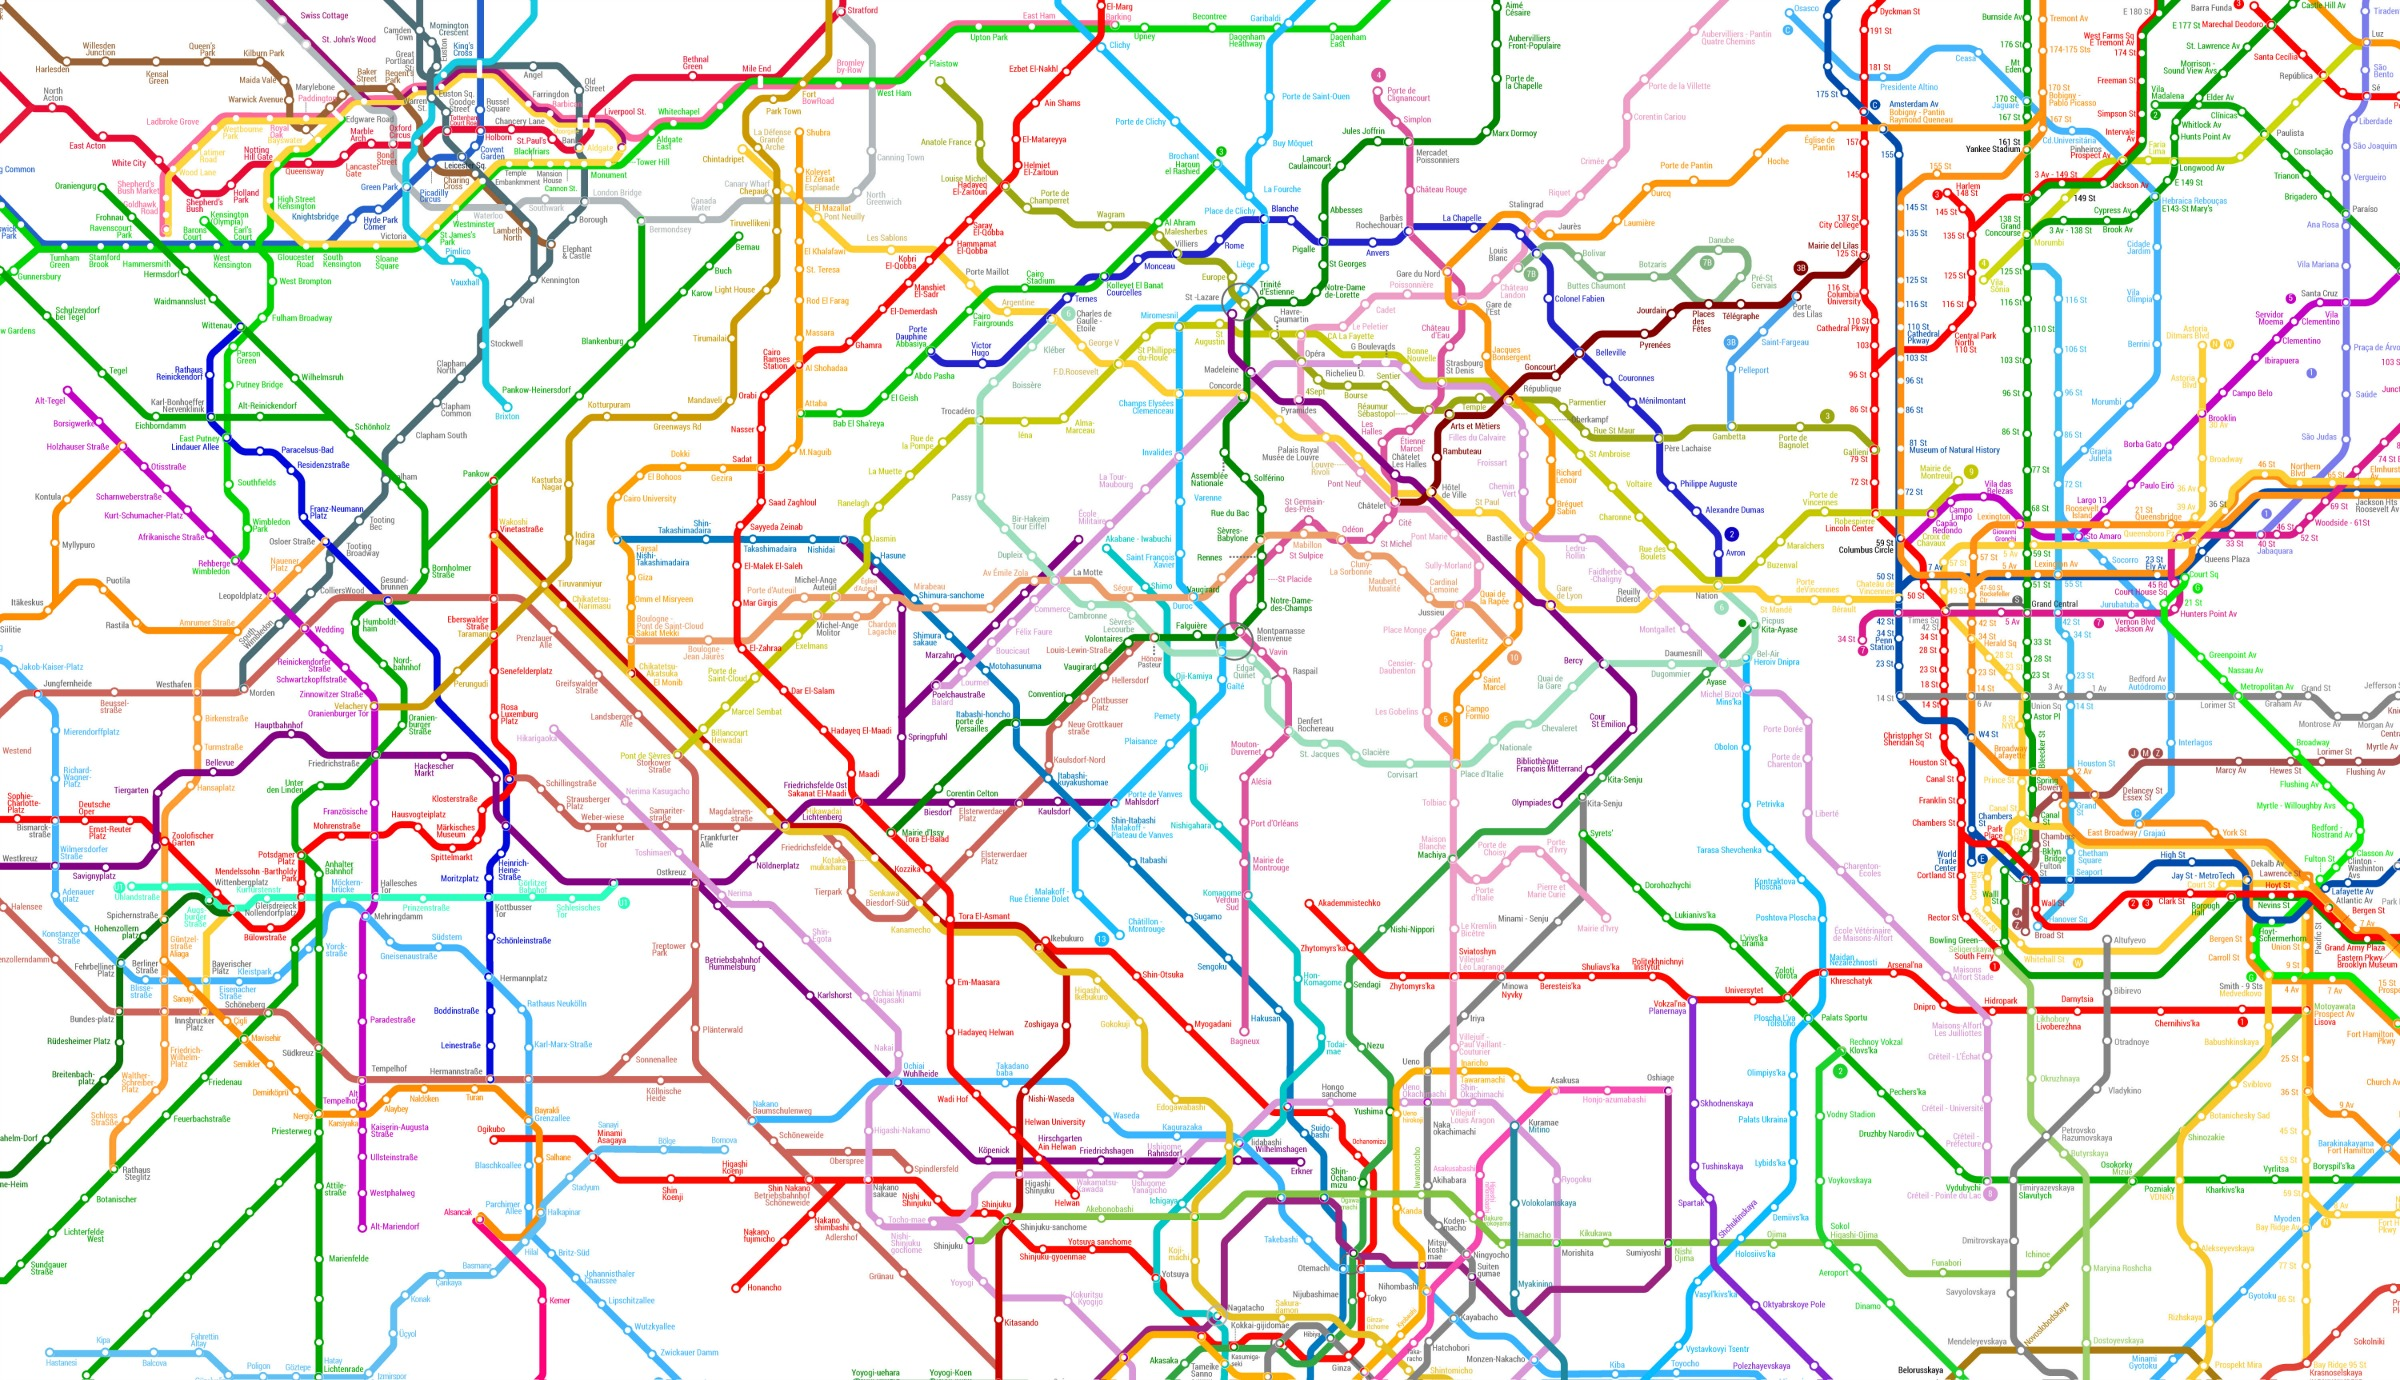 The World Metro Map